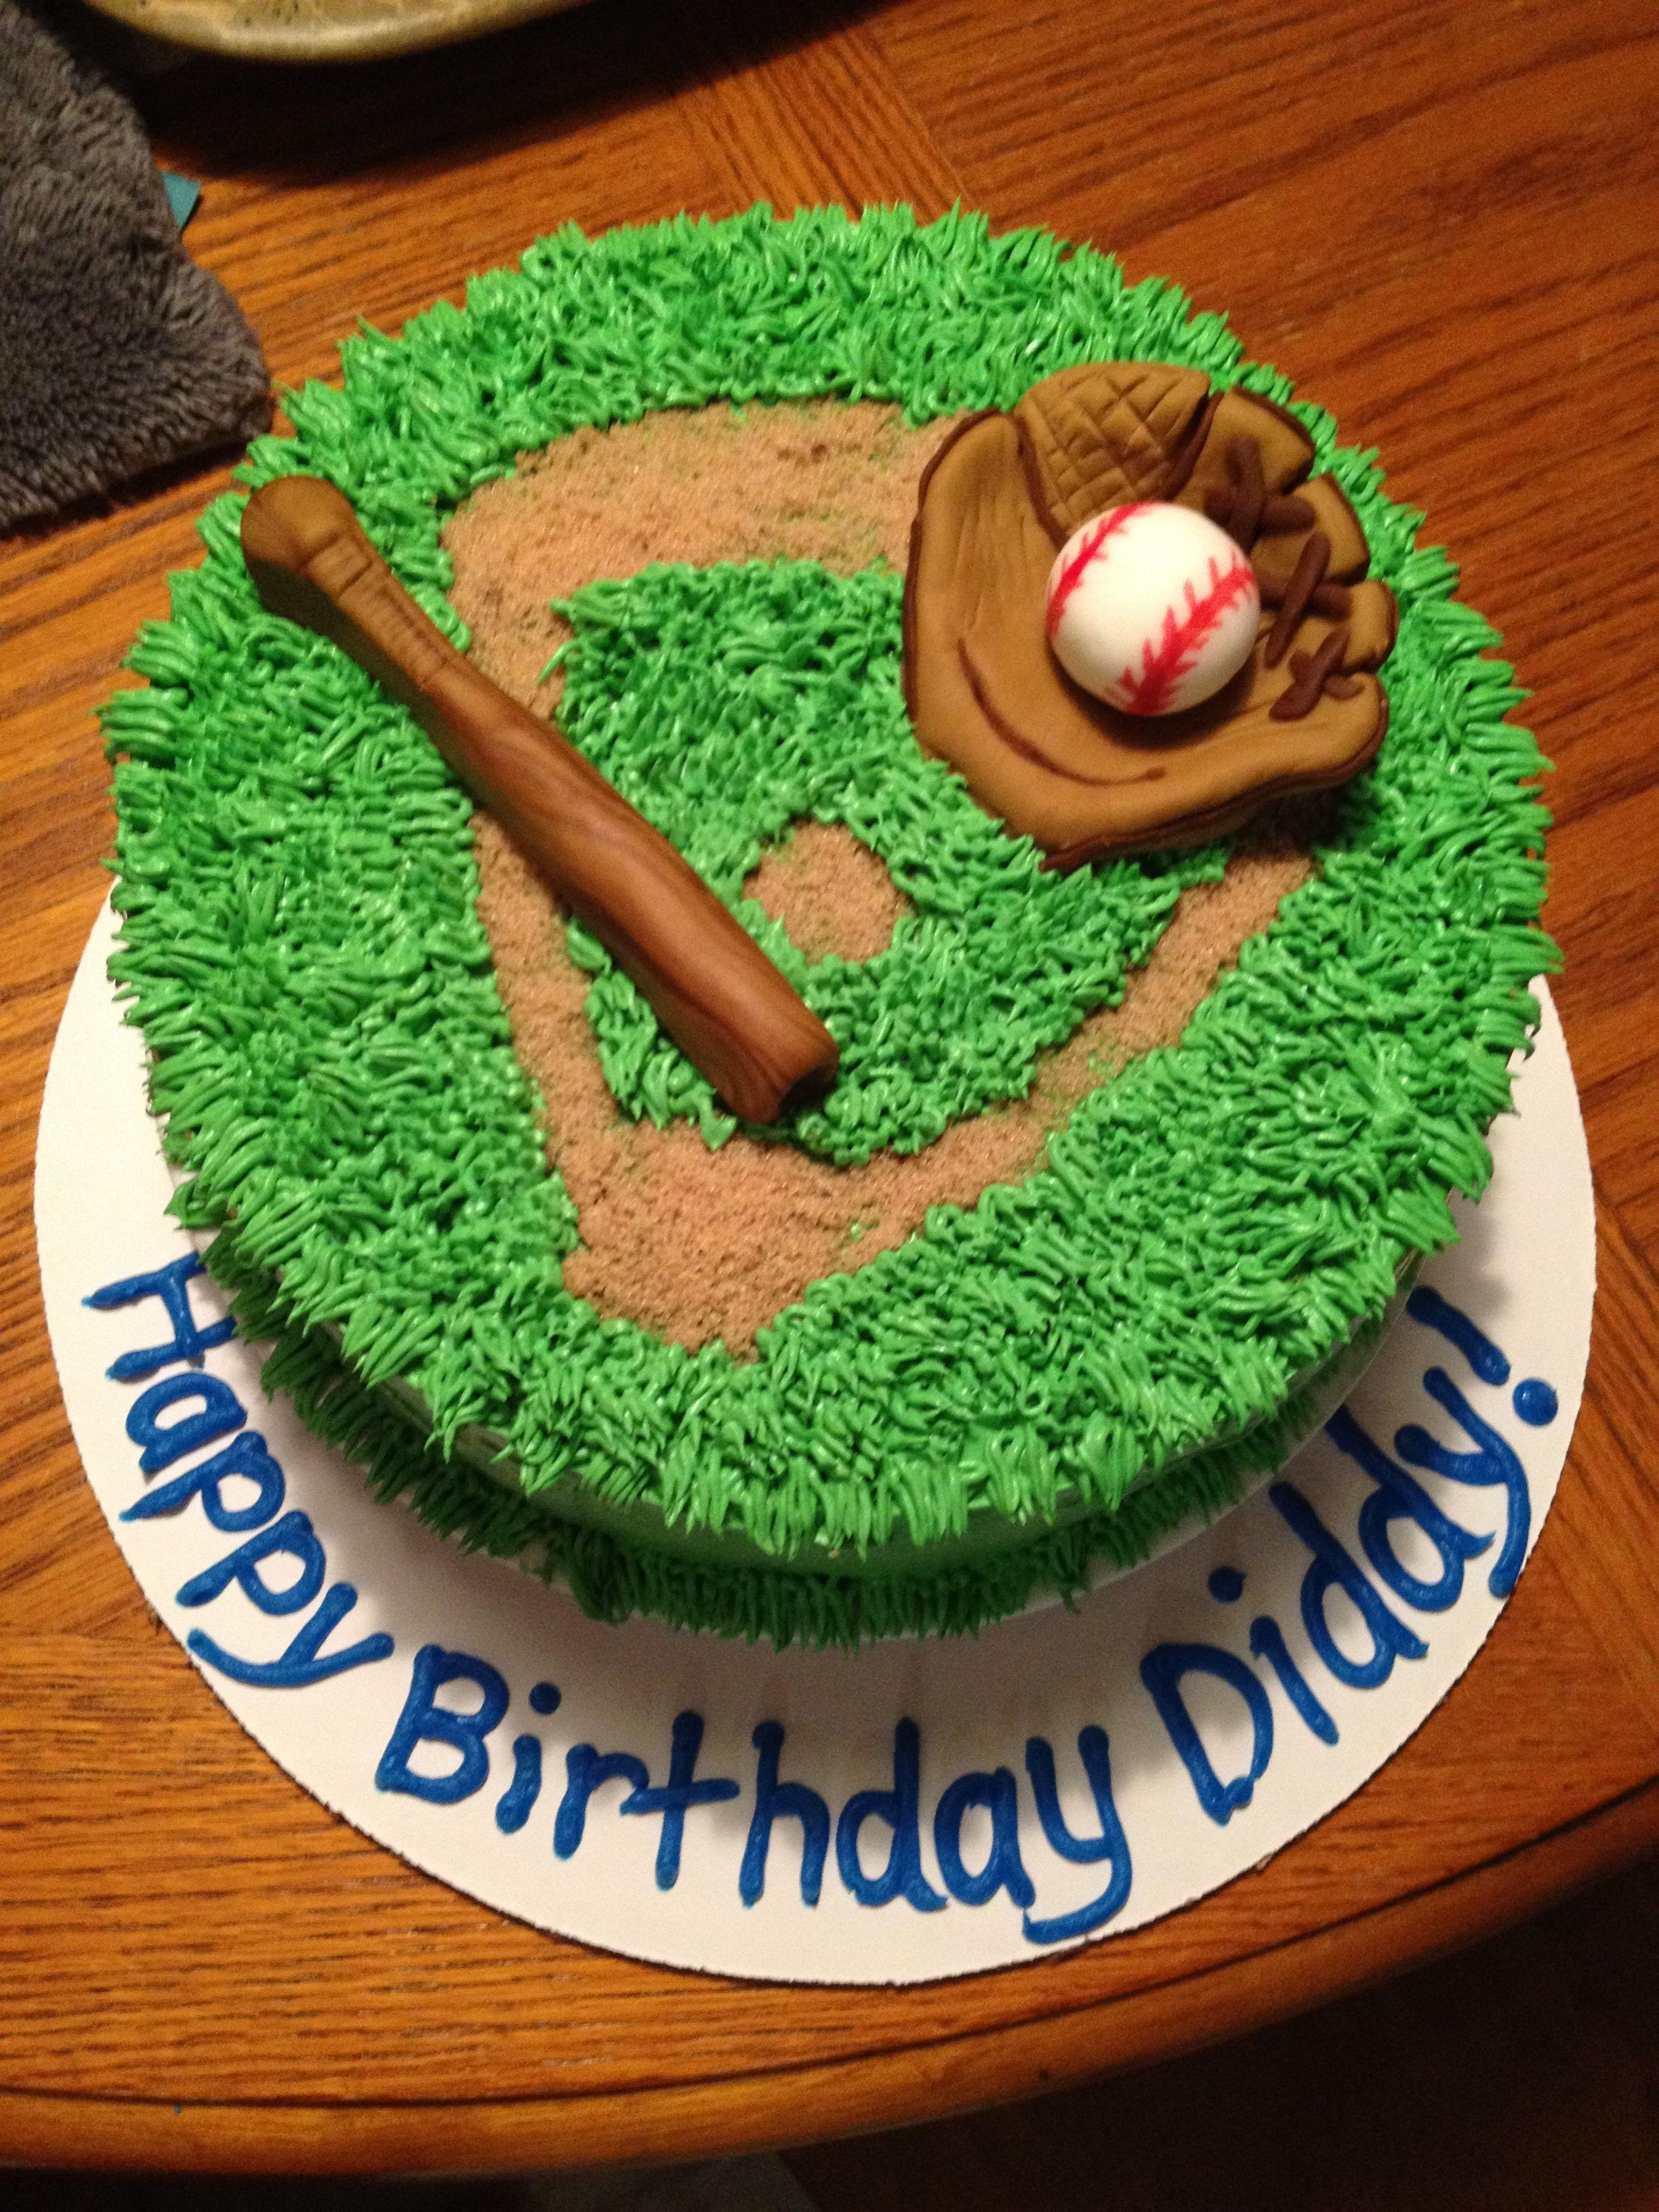 Astounding Baseball Cake With Images Baseball Birthday Cakes Baseball Birthday Cards Printable Inklcafe Filternl